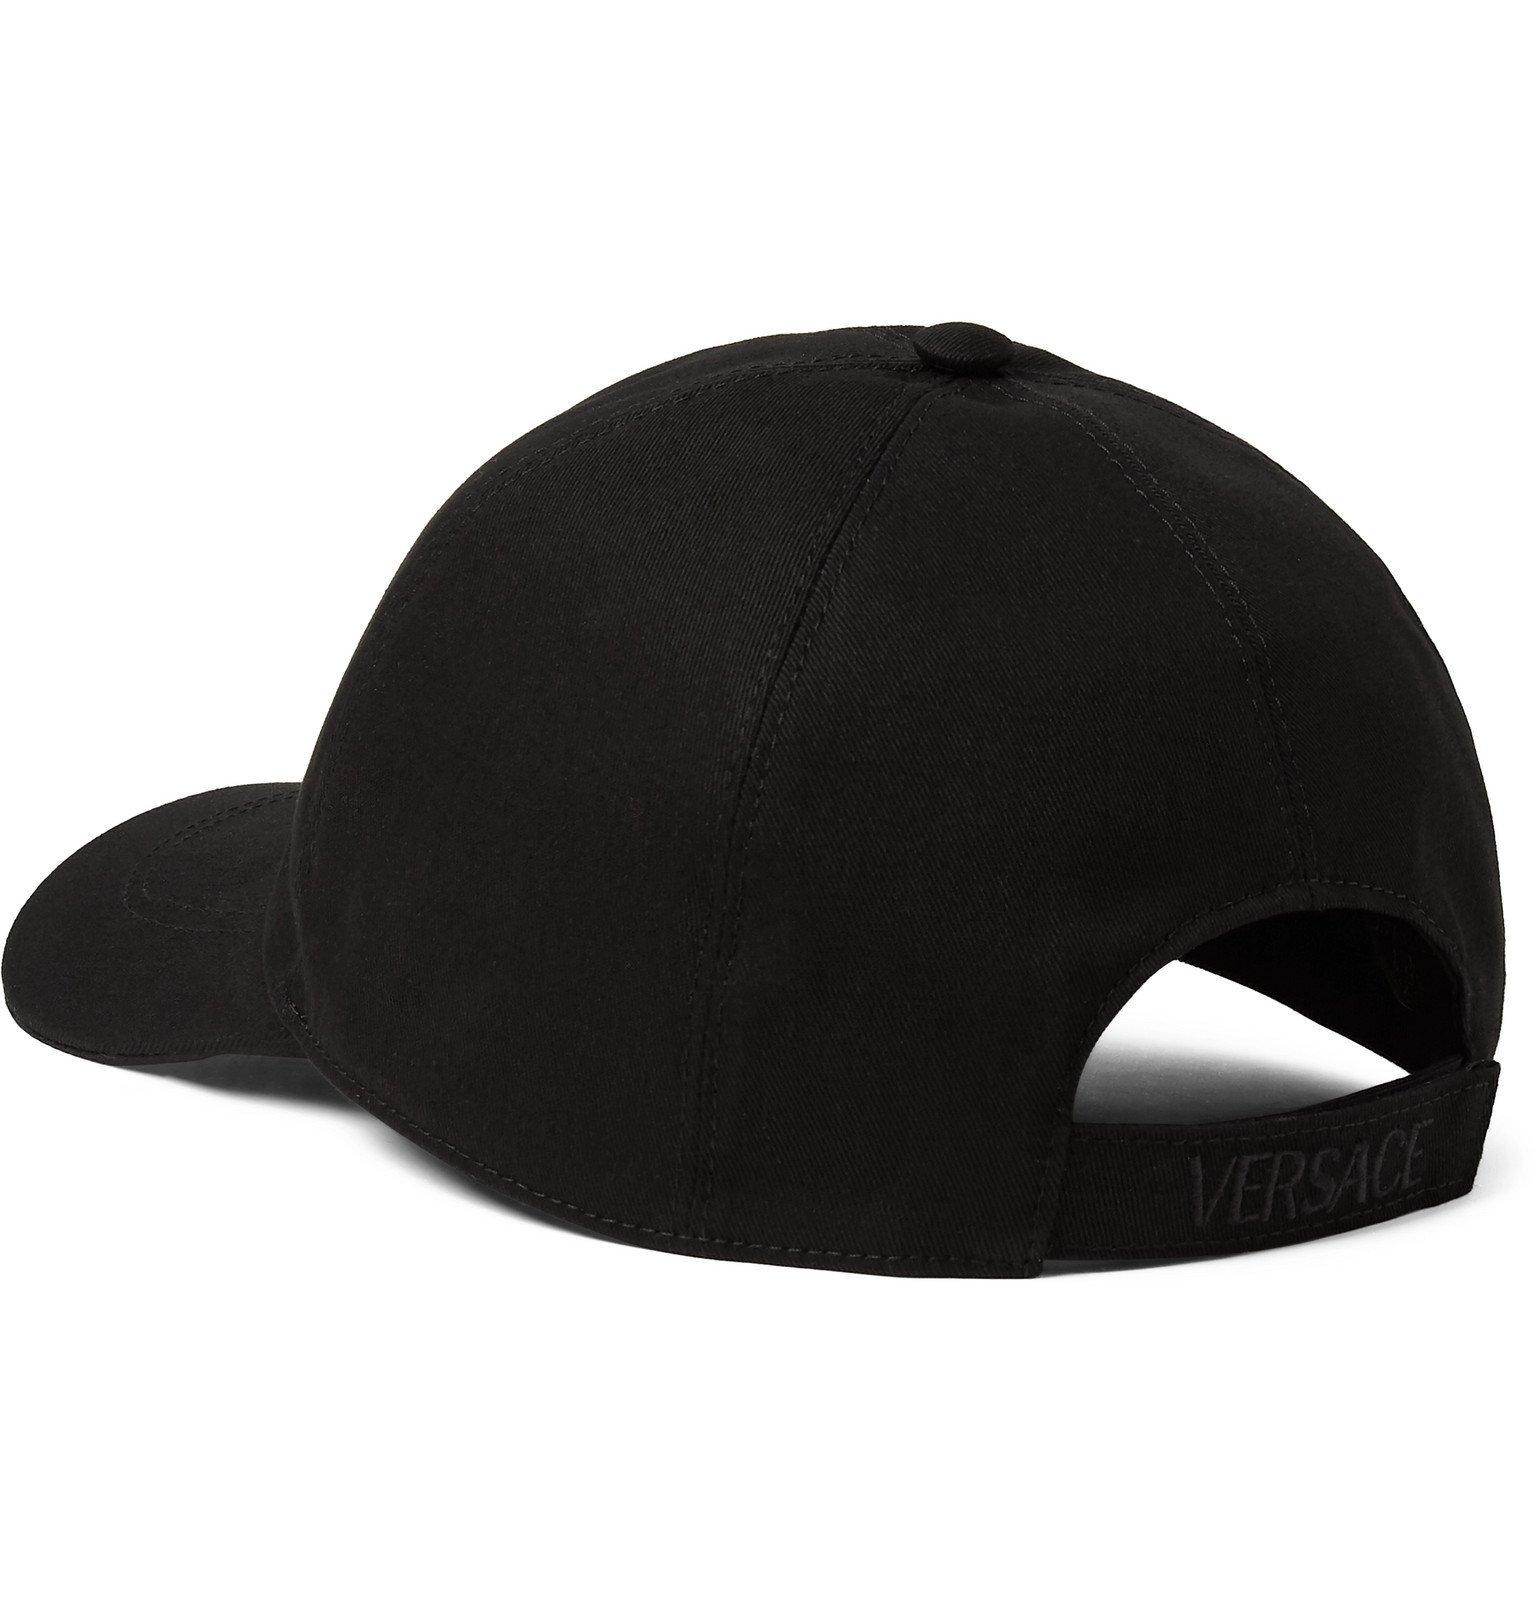 Versace - Logo-Embroidered Cotton-Twill Baseball Cap - Black